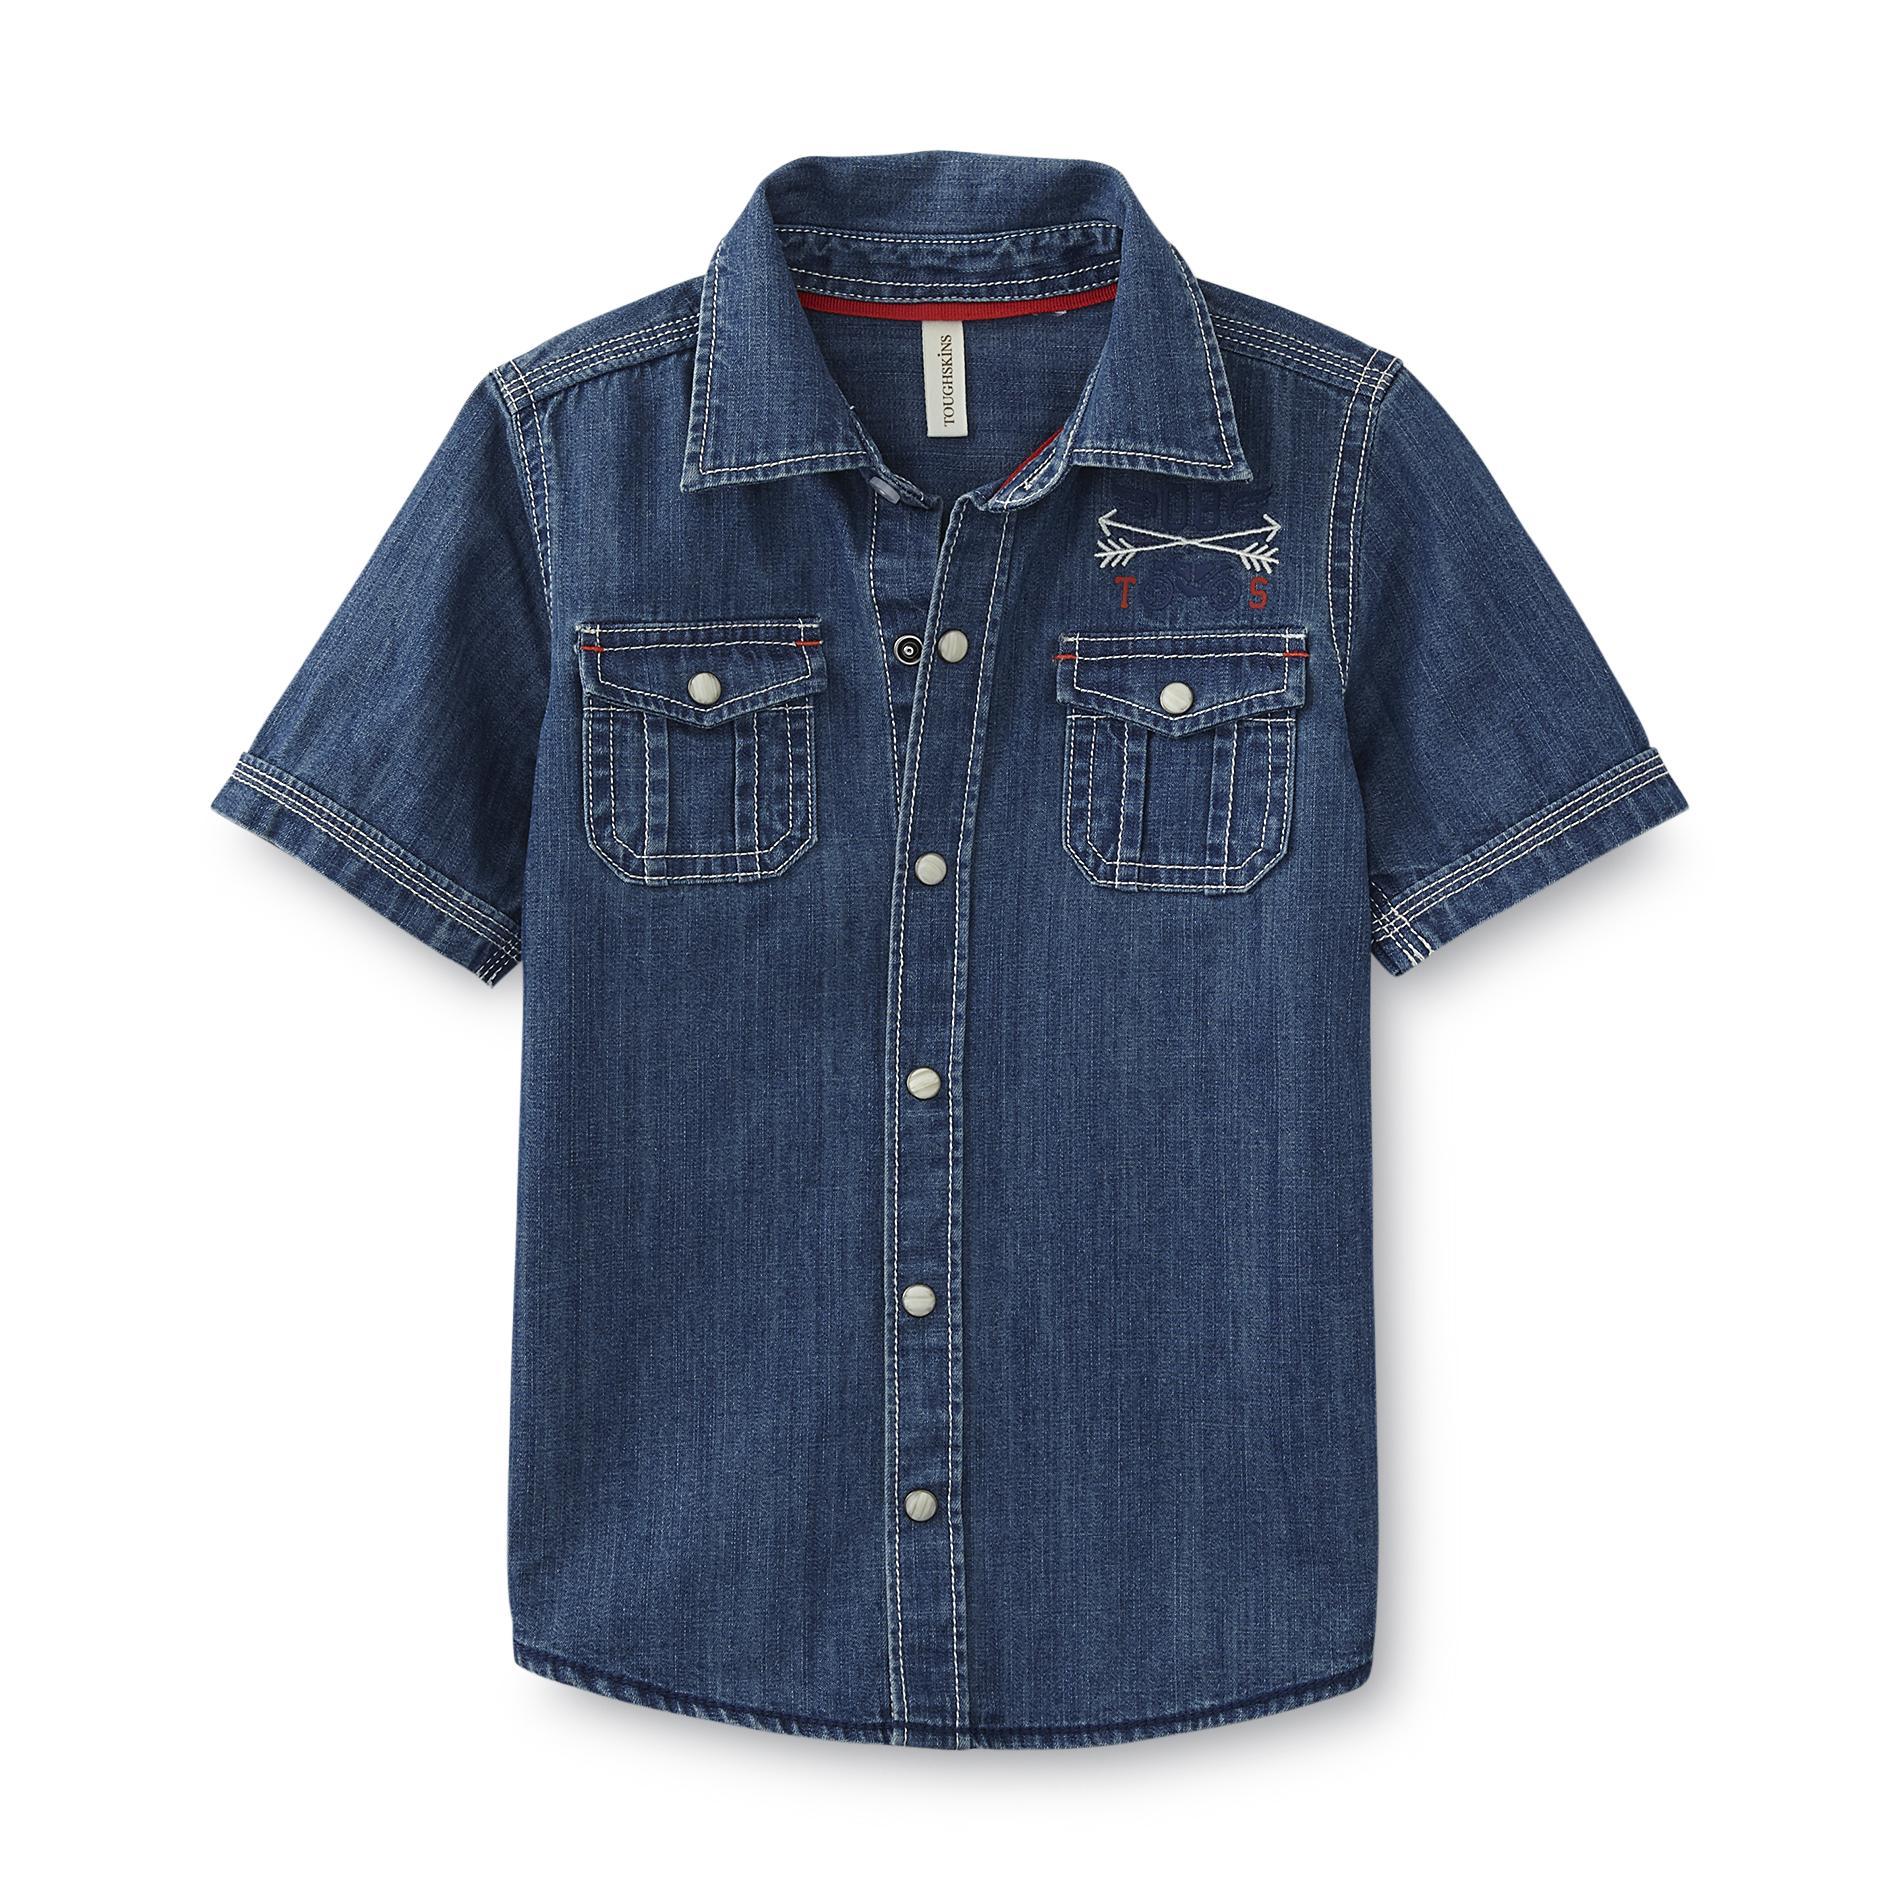 Infant & Toddler Boy's Denim Shirt